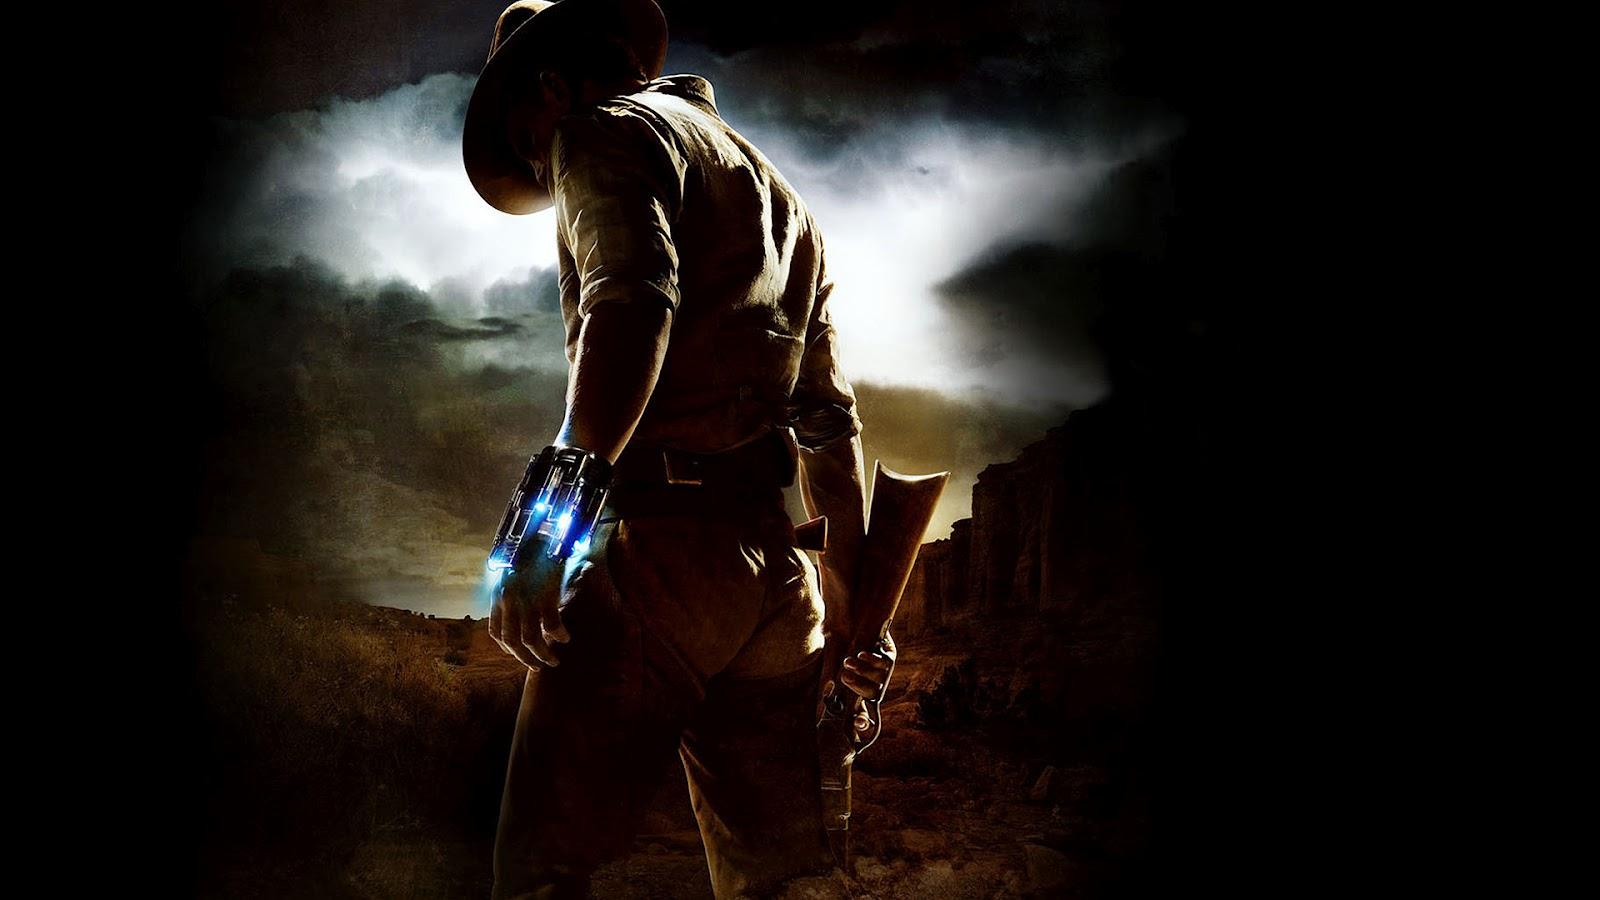 http://4.bp.blogspot.com/-RJNEvR4T-_g/UBKnKz7AZzI/AAAAAAAADGo/WzJilzZgHQQ/s1600/Cowboys-Aliens-2011-Wallpapers-2.jpg